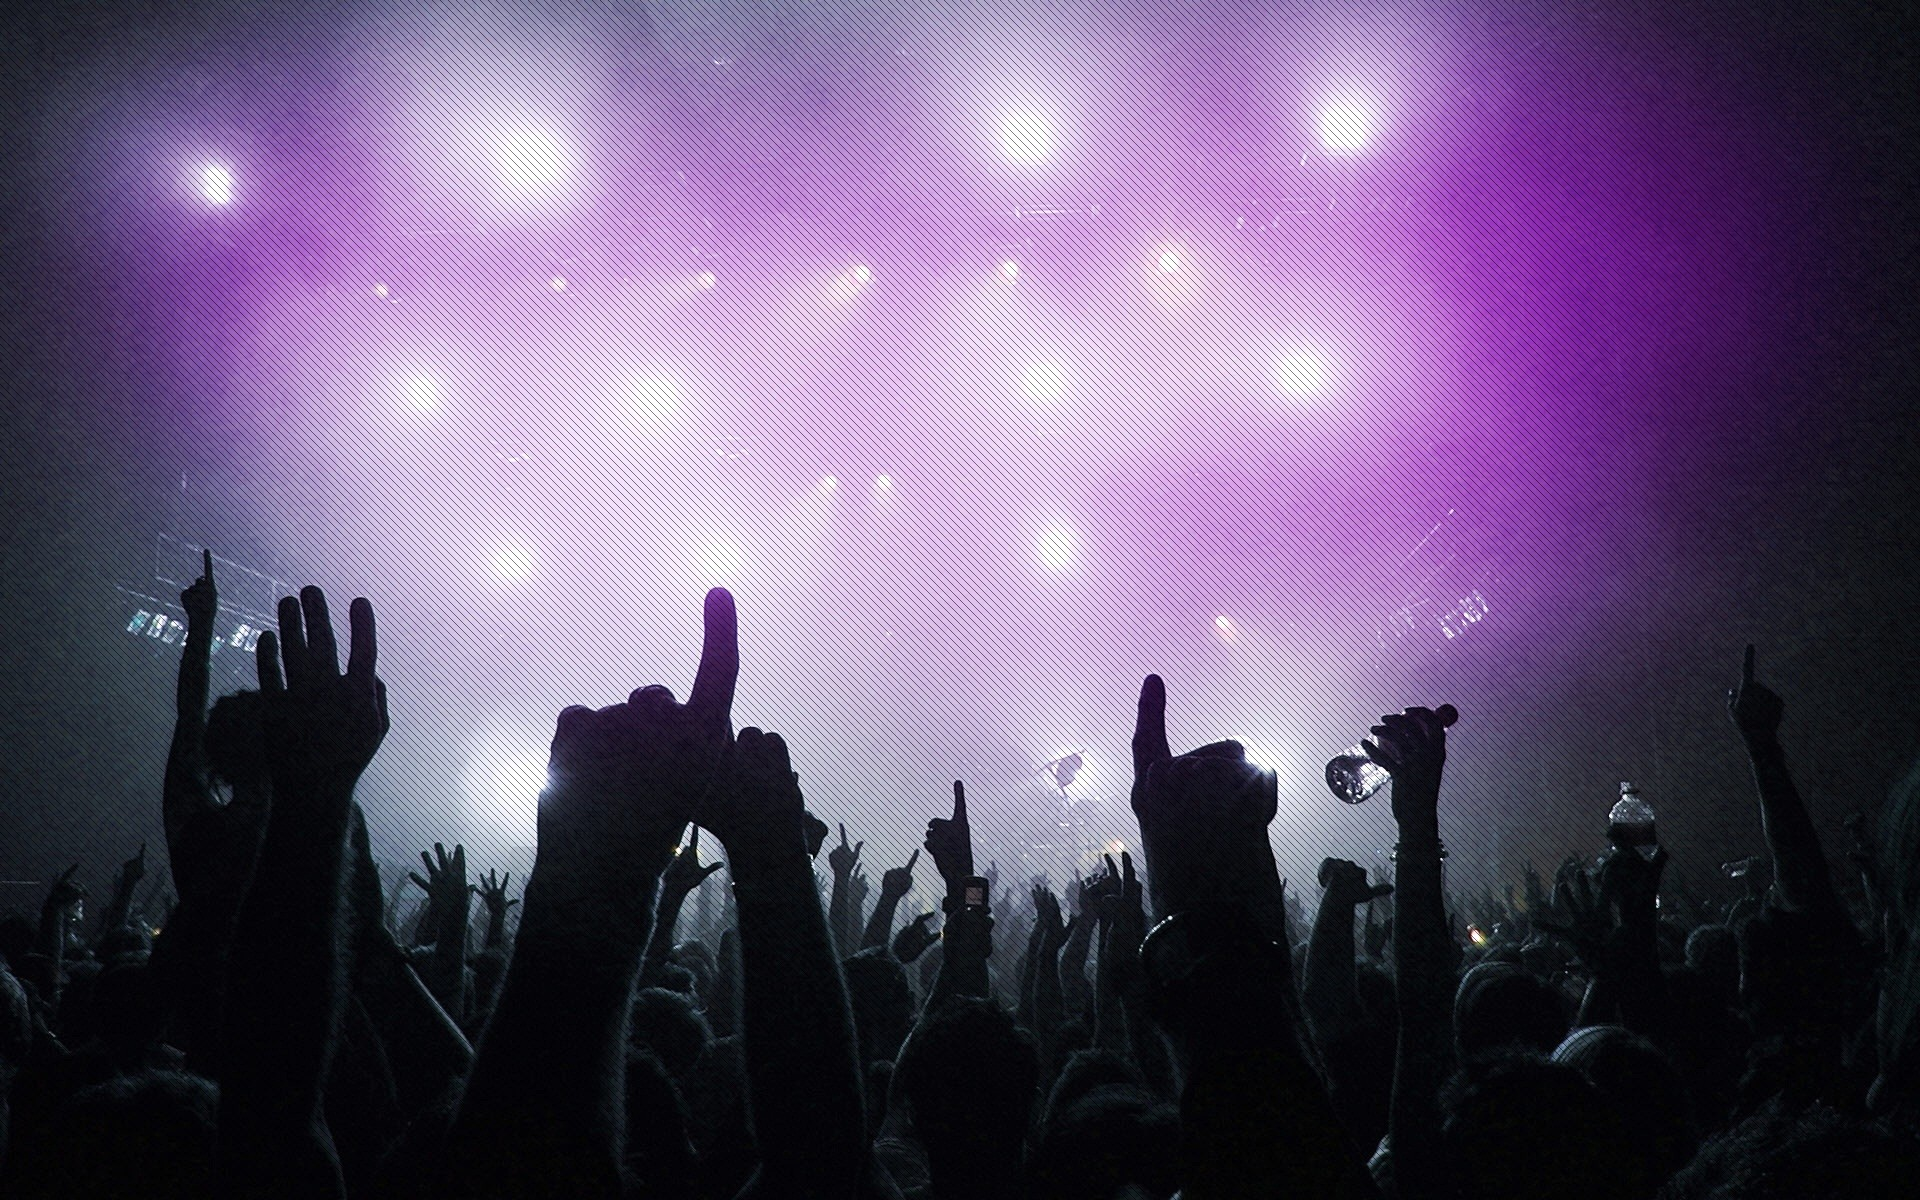 party_night-1920x1200.jpg